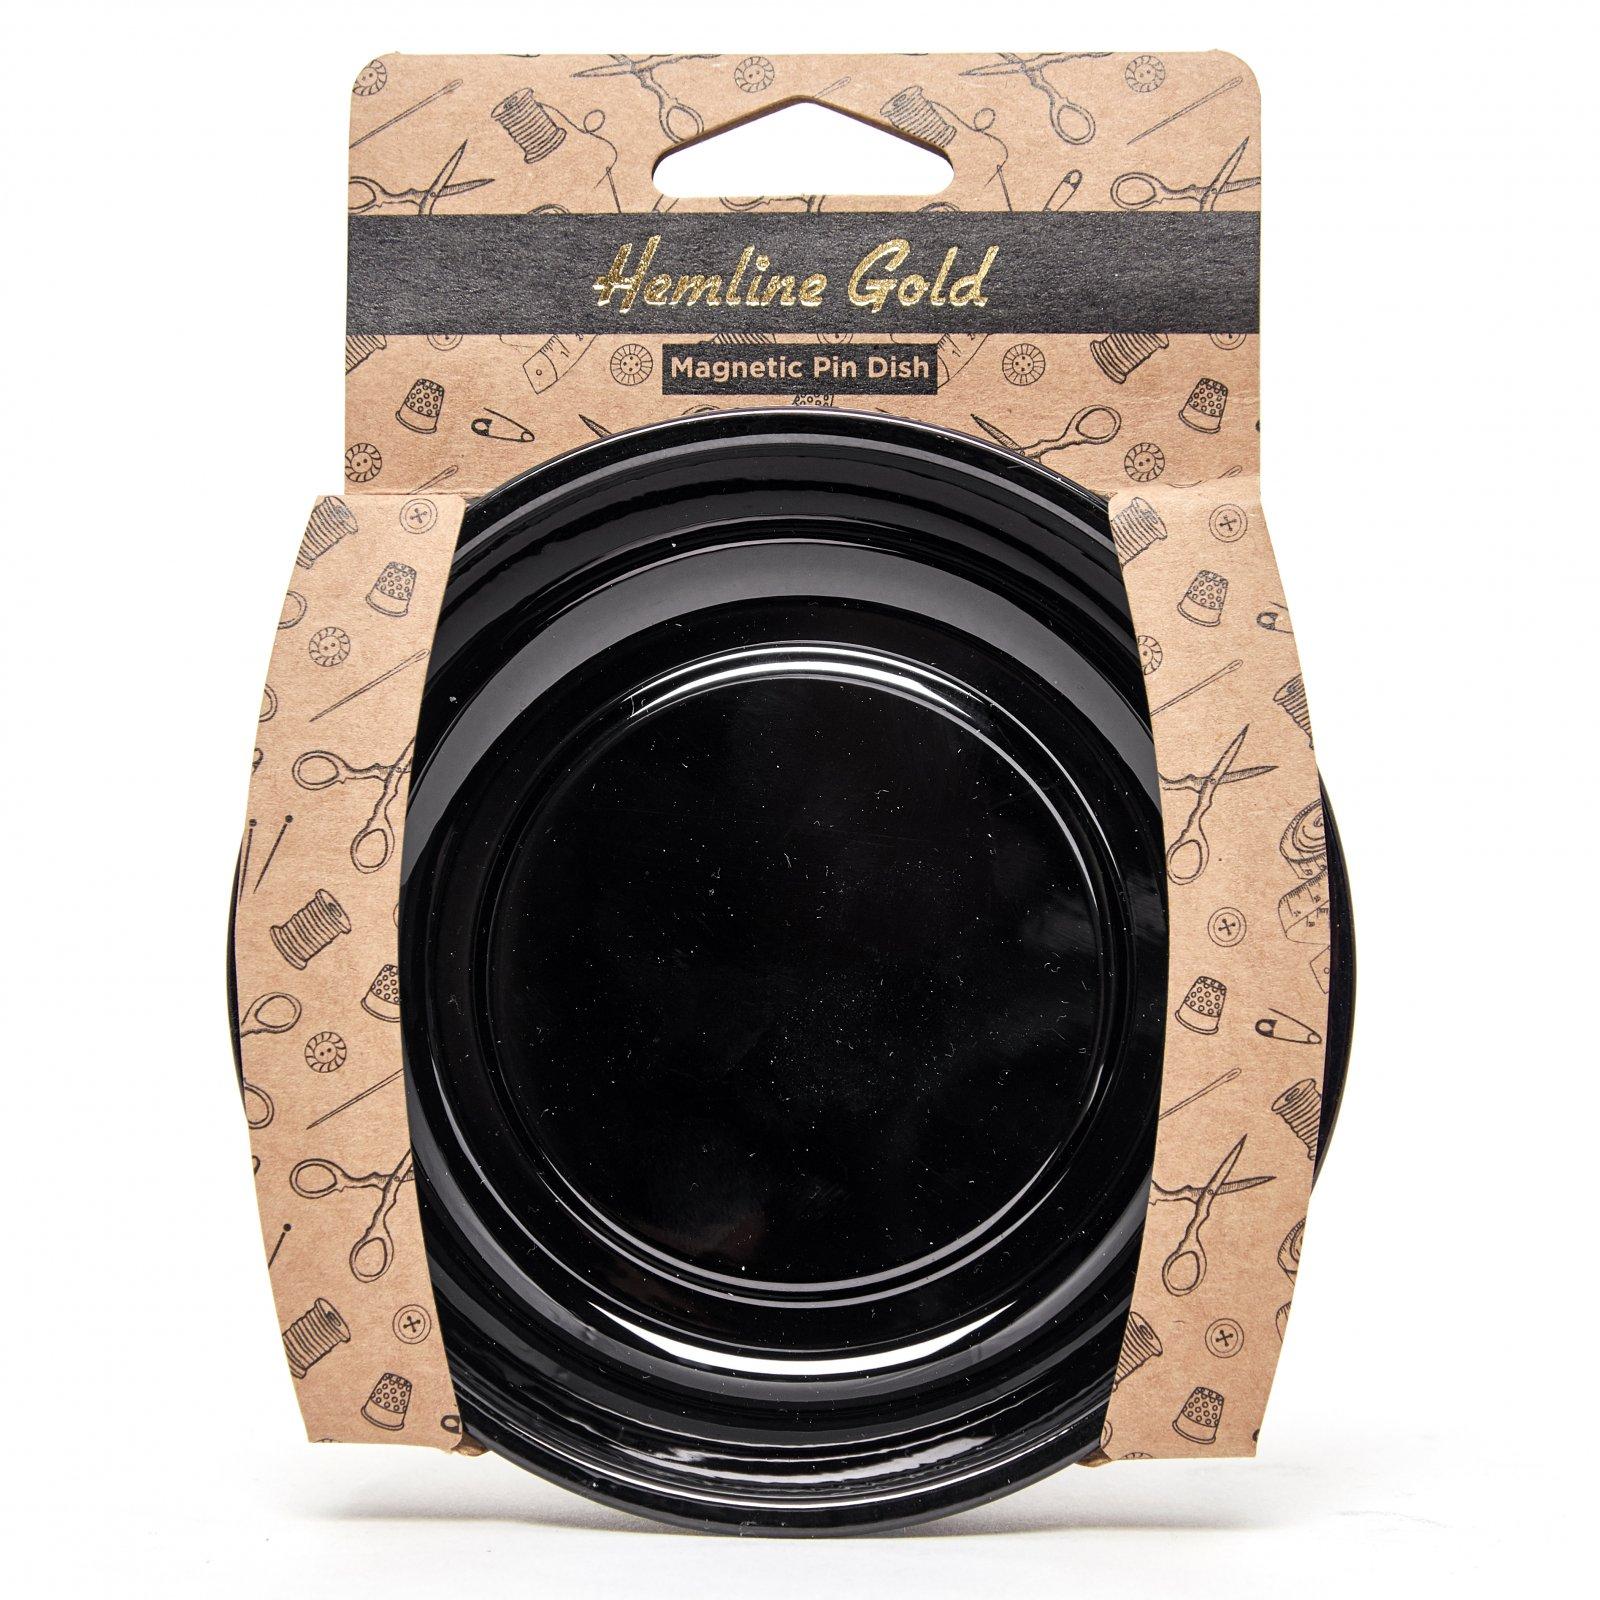 Magnetic Pin Dish Black - Hemline Gold